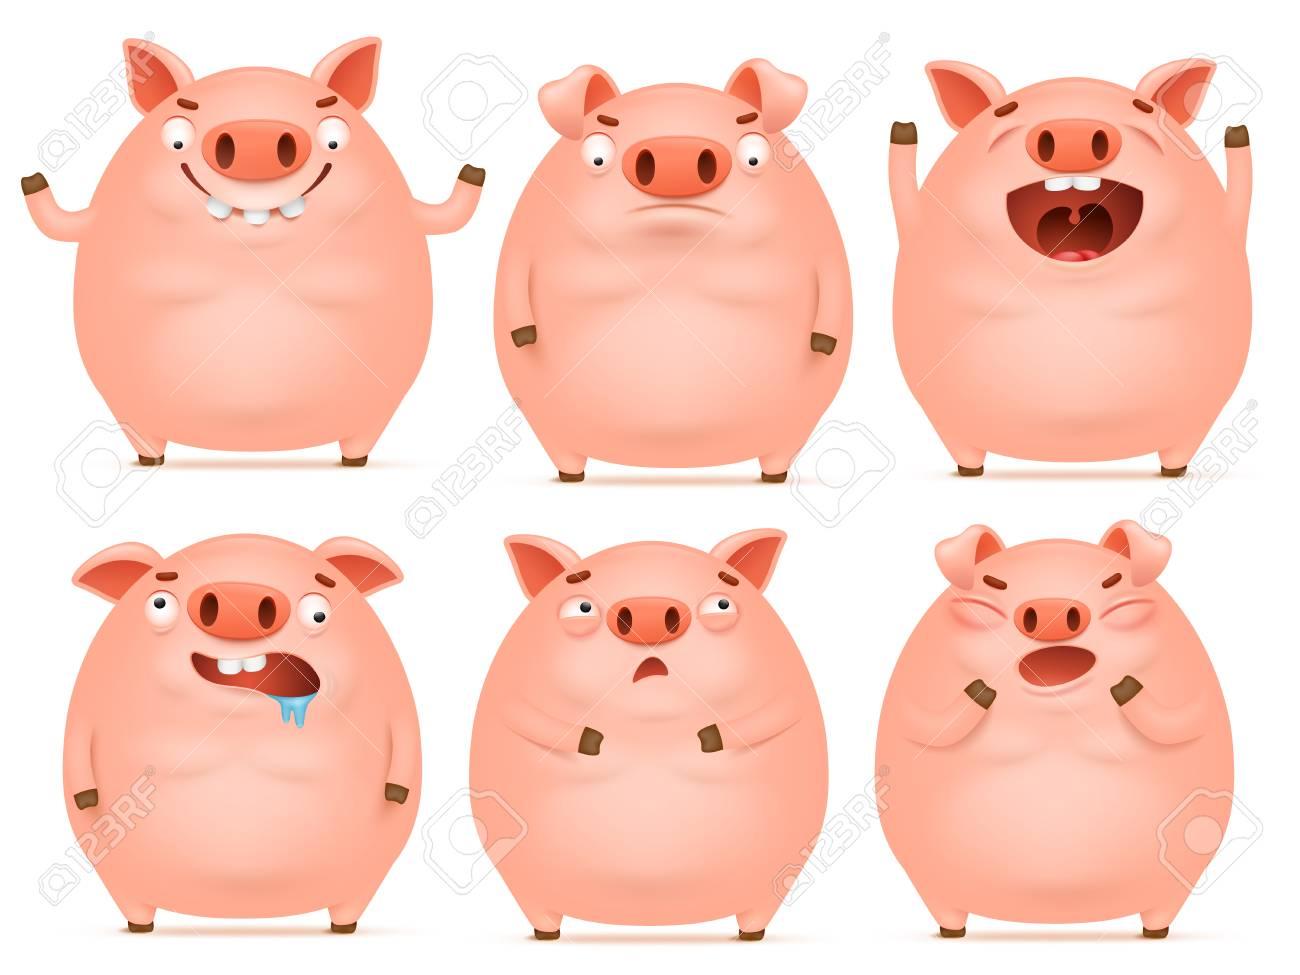 set of cute cartoon emotional pink pig characters vector